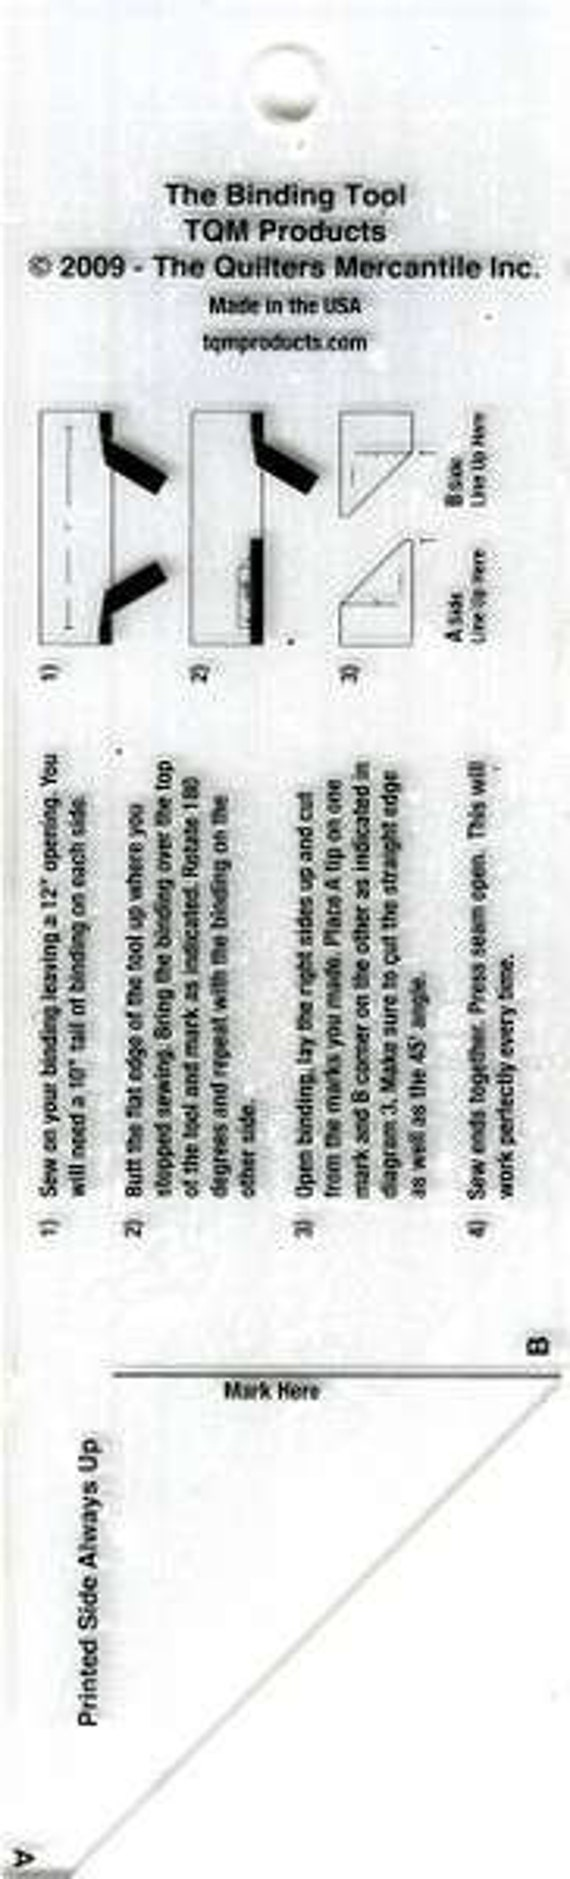 french braid helper tool instructions